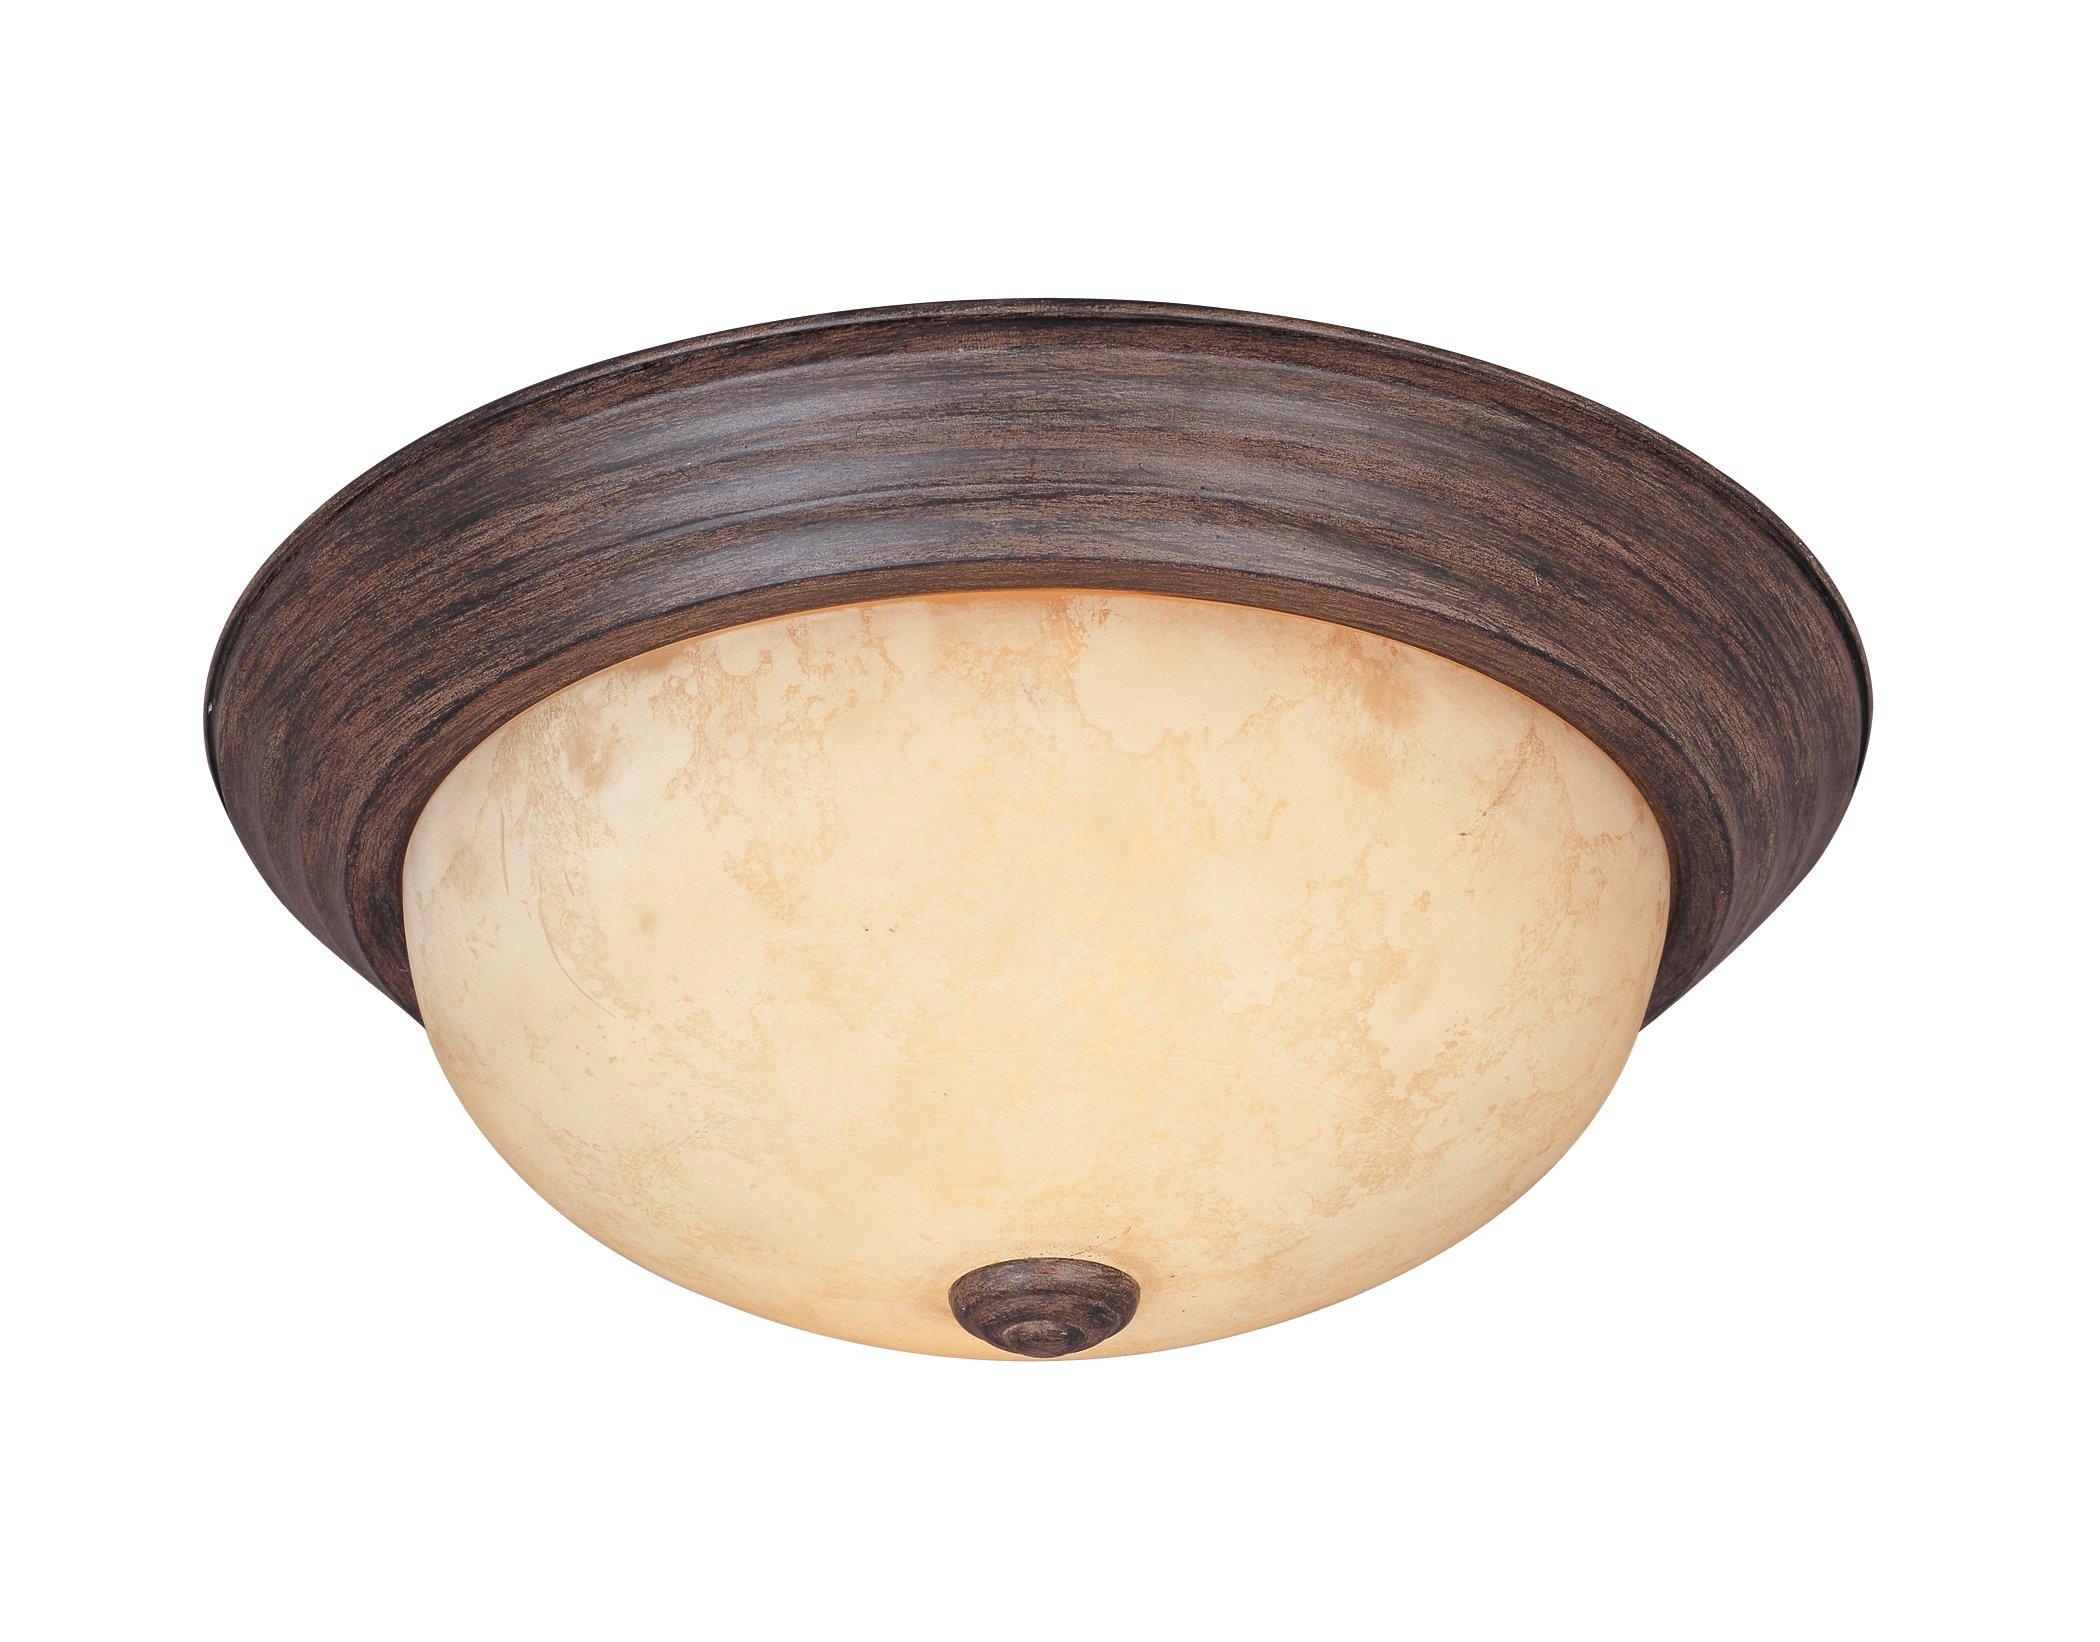 1257S-WM-AM Flushmount Ceiling Light Warm Mahogany 2-Light 11'' Fixture